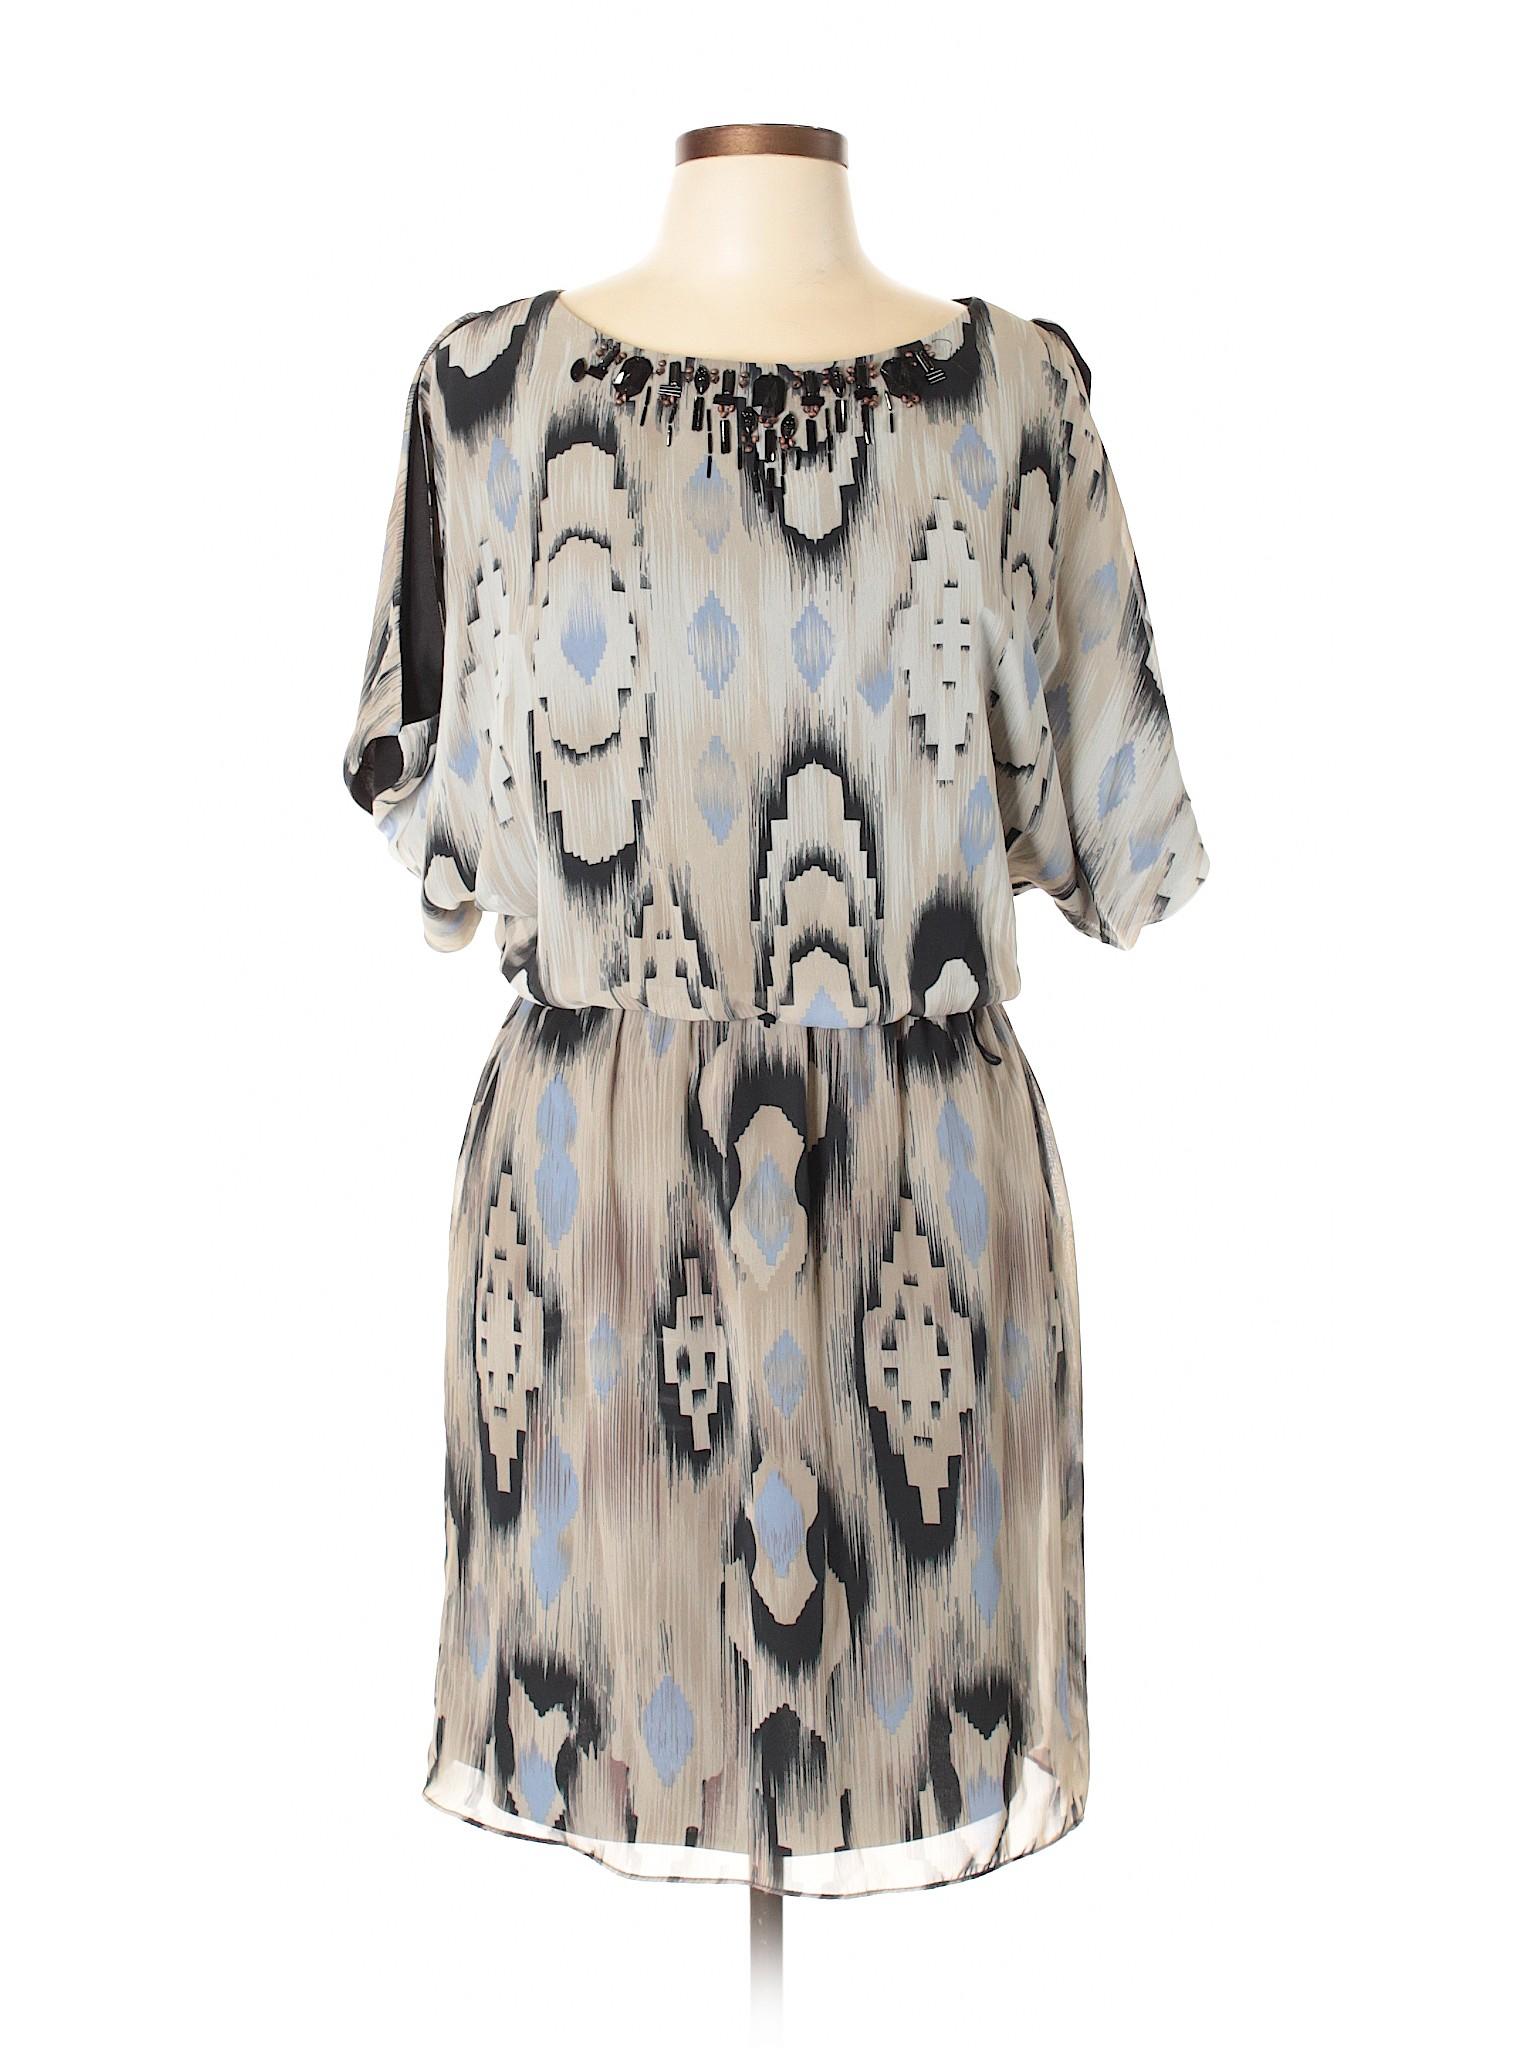 Casual DressBarn Selling DressBarn Selling DressBarn Dress Casual Selling Dress 4wqc1fI06